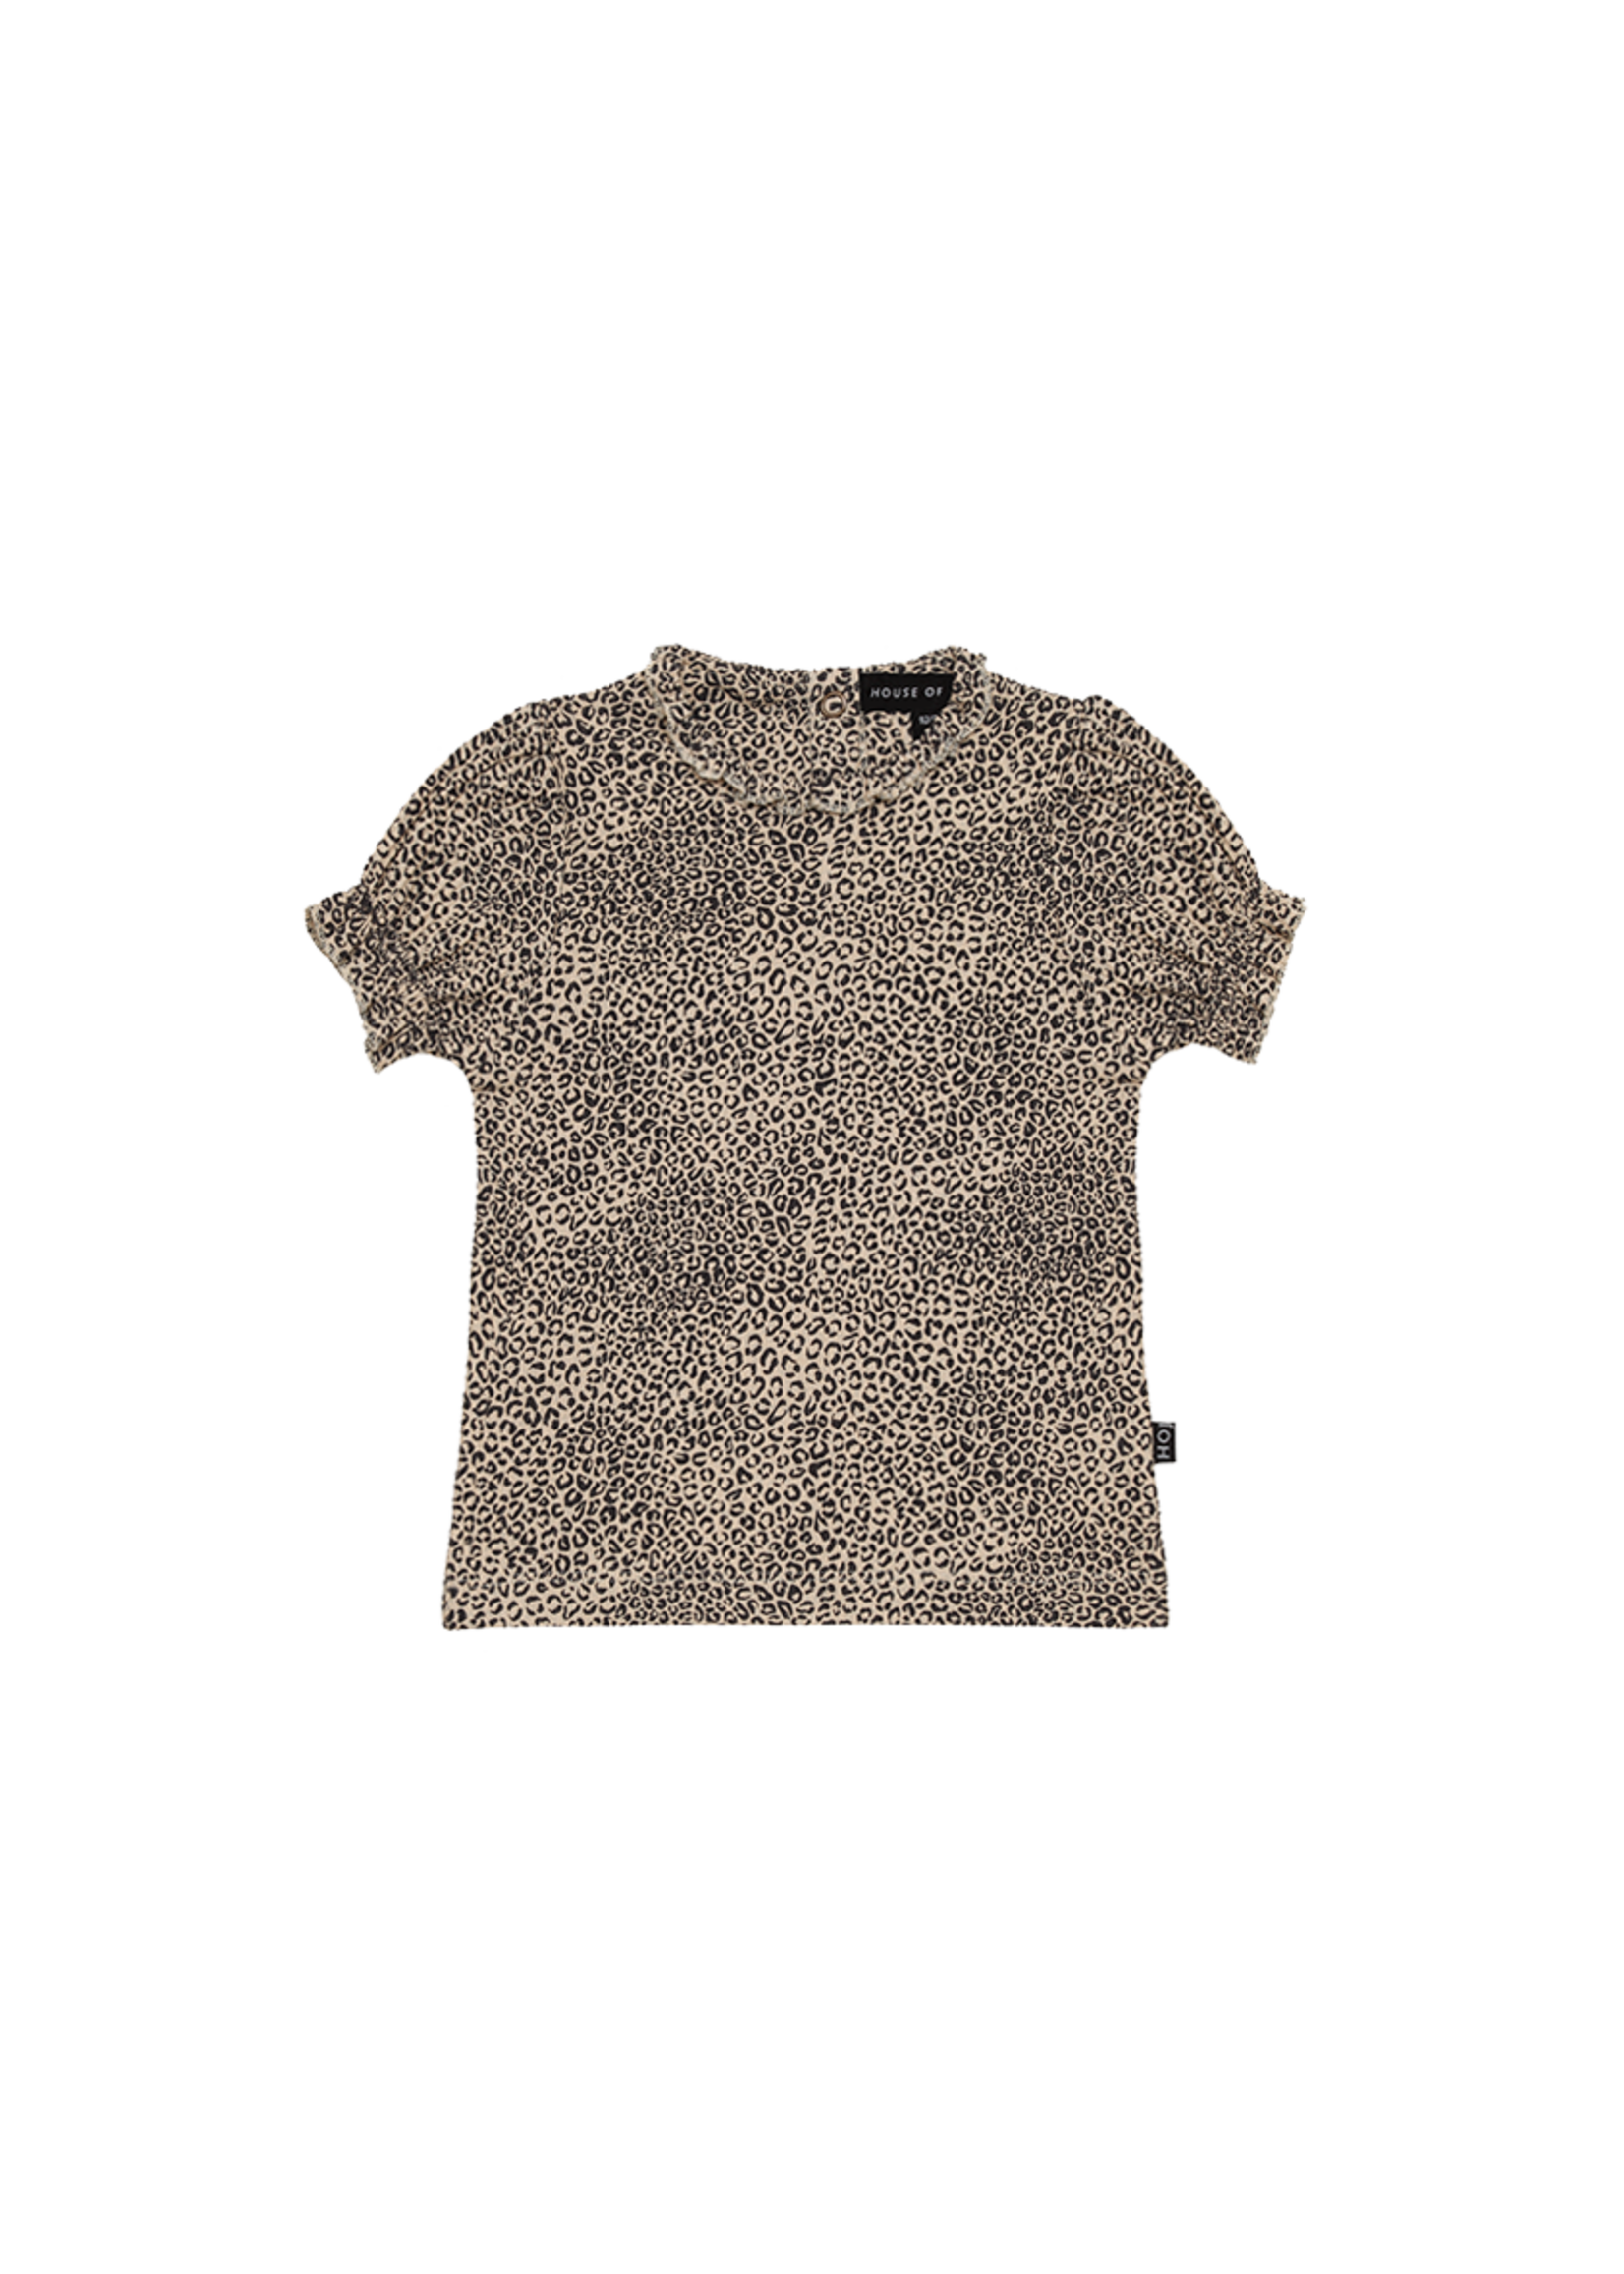 House of Jamie HOJ - Puff Rib Shoulder Tee Charcoal Little Leopard